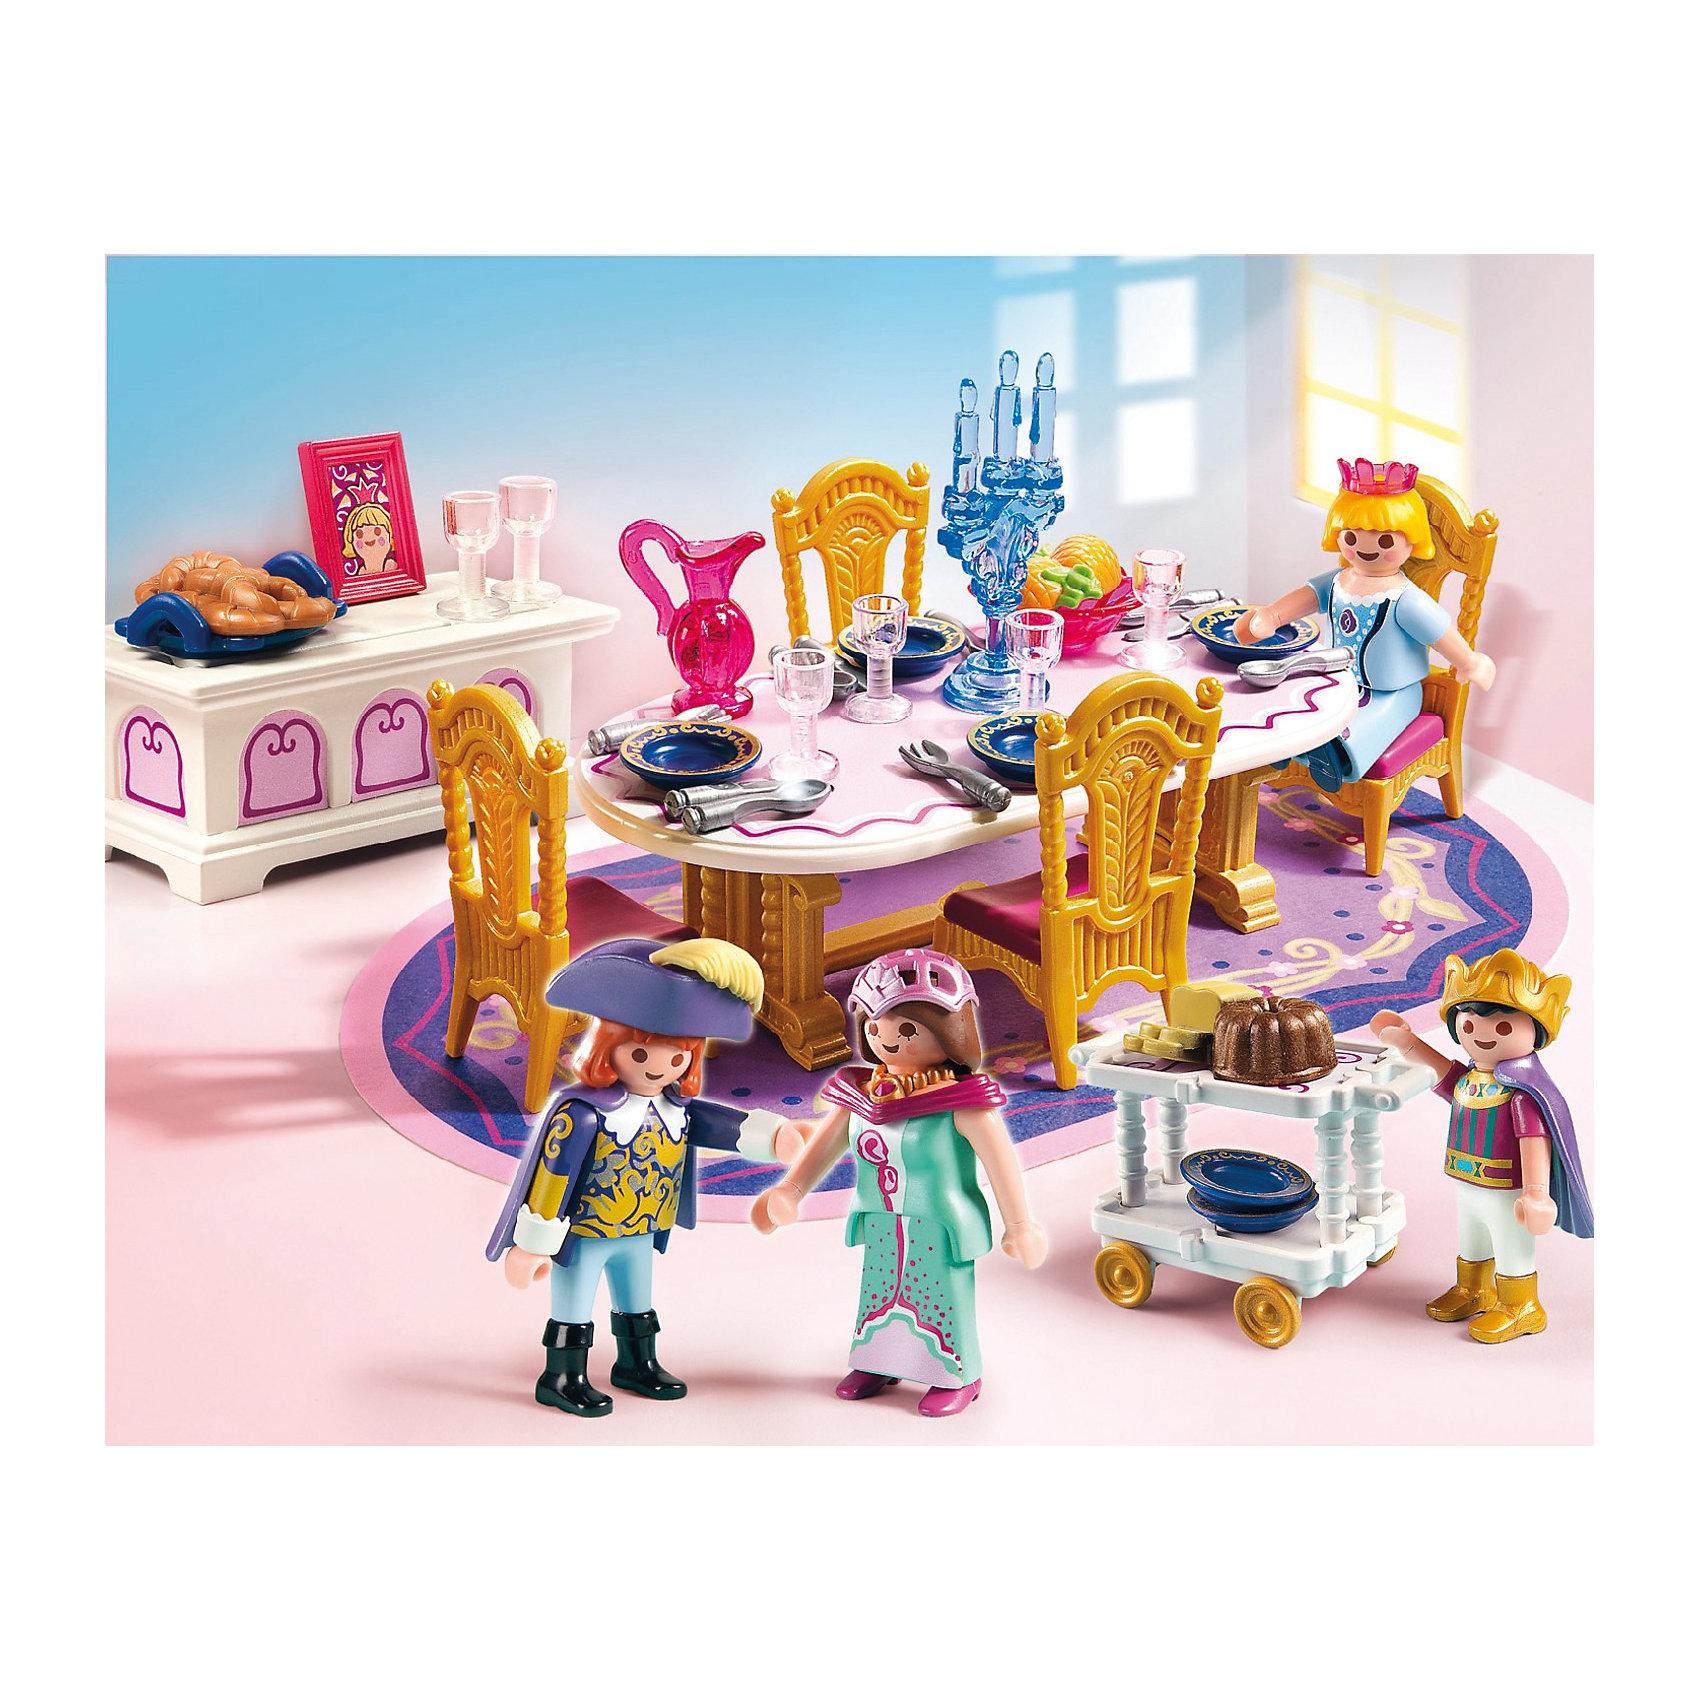 PLAYMOBIL® Королевский обеденный зал, PLAYMOBIL playmobil® playmobil 5546 парк развлечений продавец шаров smileyworld